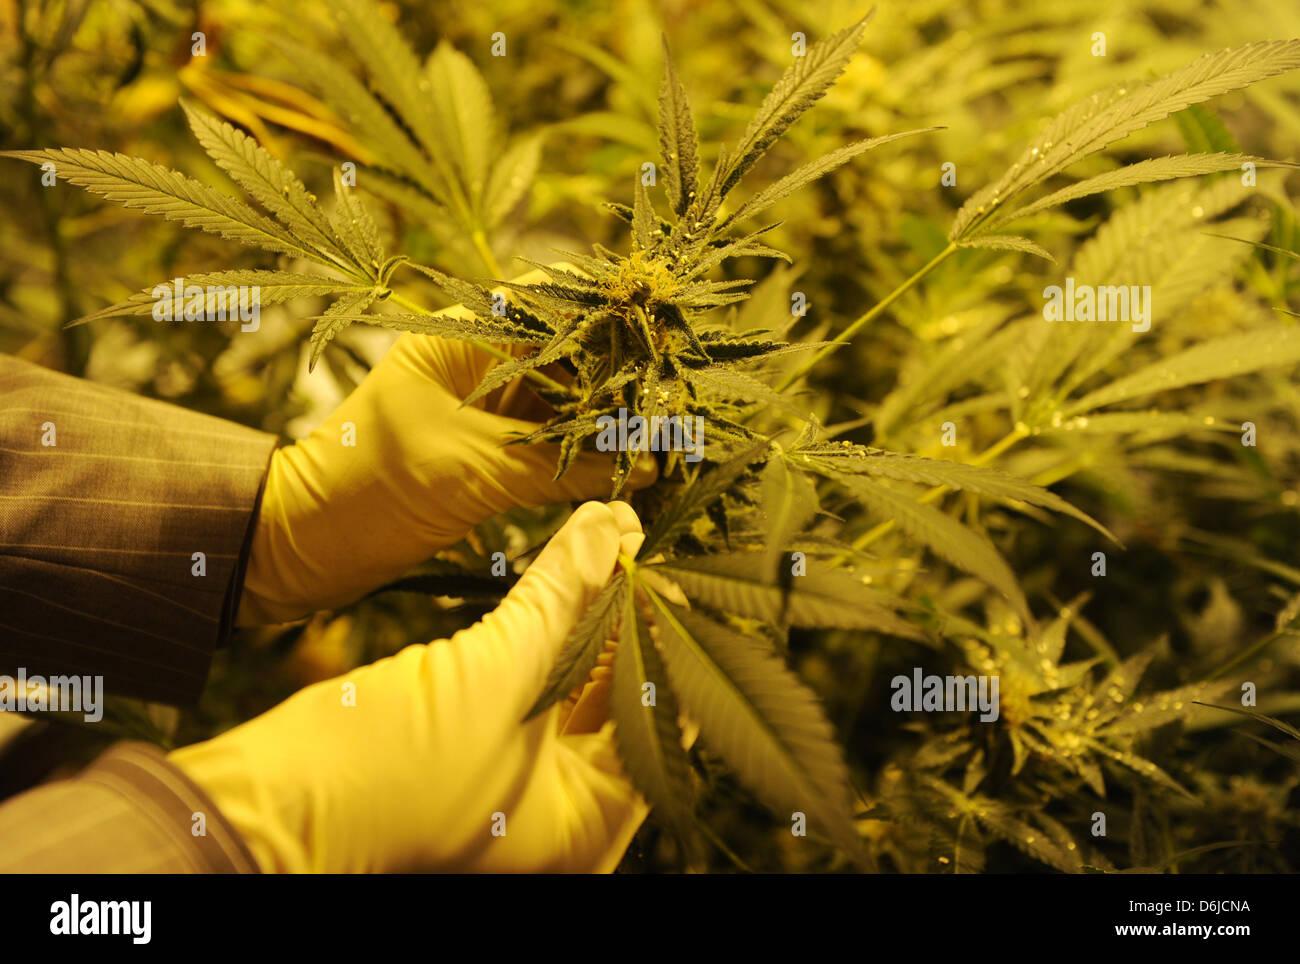 Oliver Appel, biologist for the criminal technical investigations department (KTU), examines marijuana plants for Stock Photo